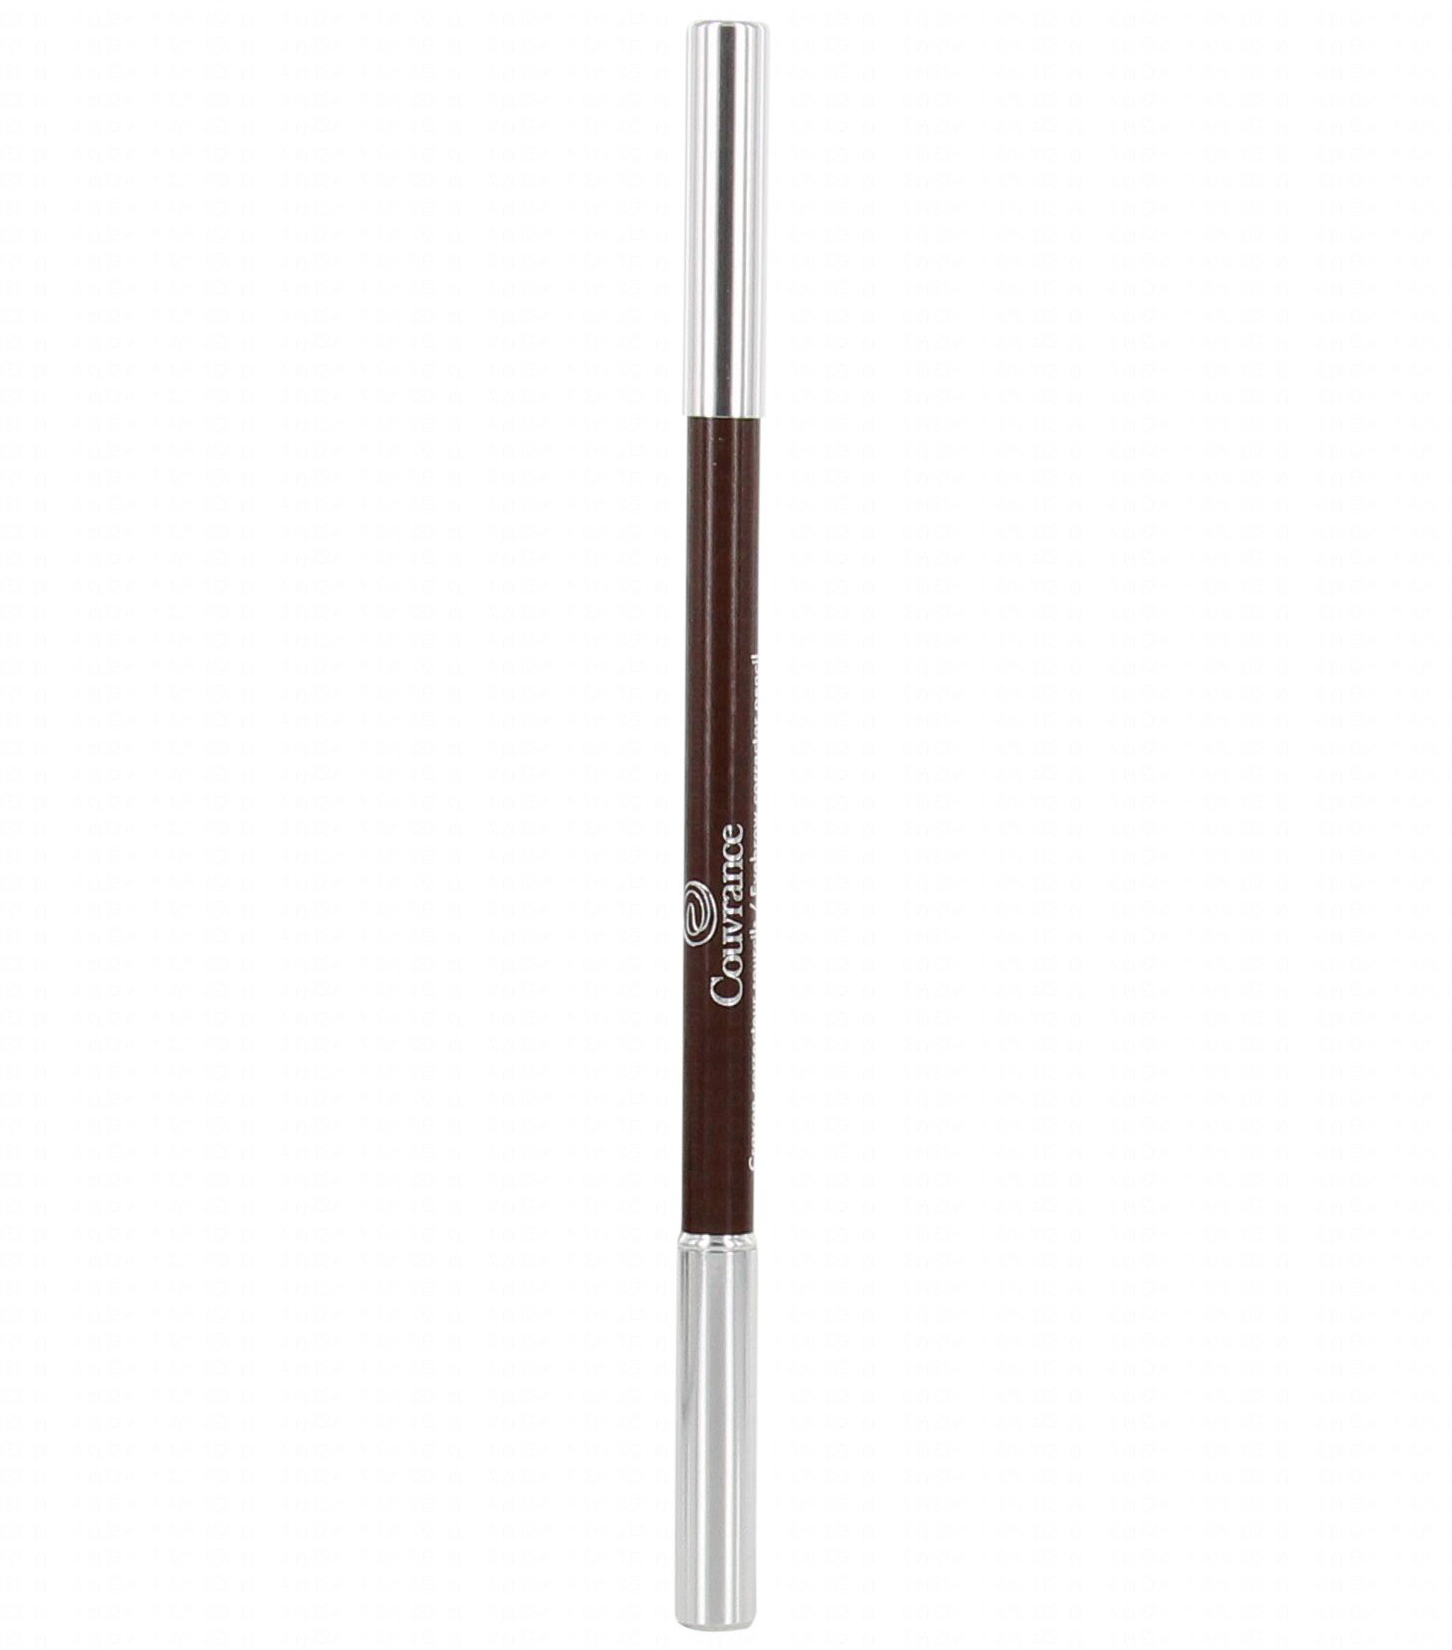 Avène Crayon Correctuer Sourcils Διορθωτικά Μολύβια Φρυδιών Σκούρο (Brun) 1.19g